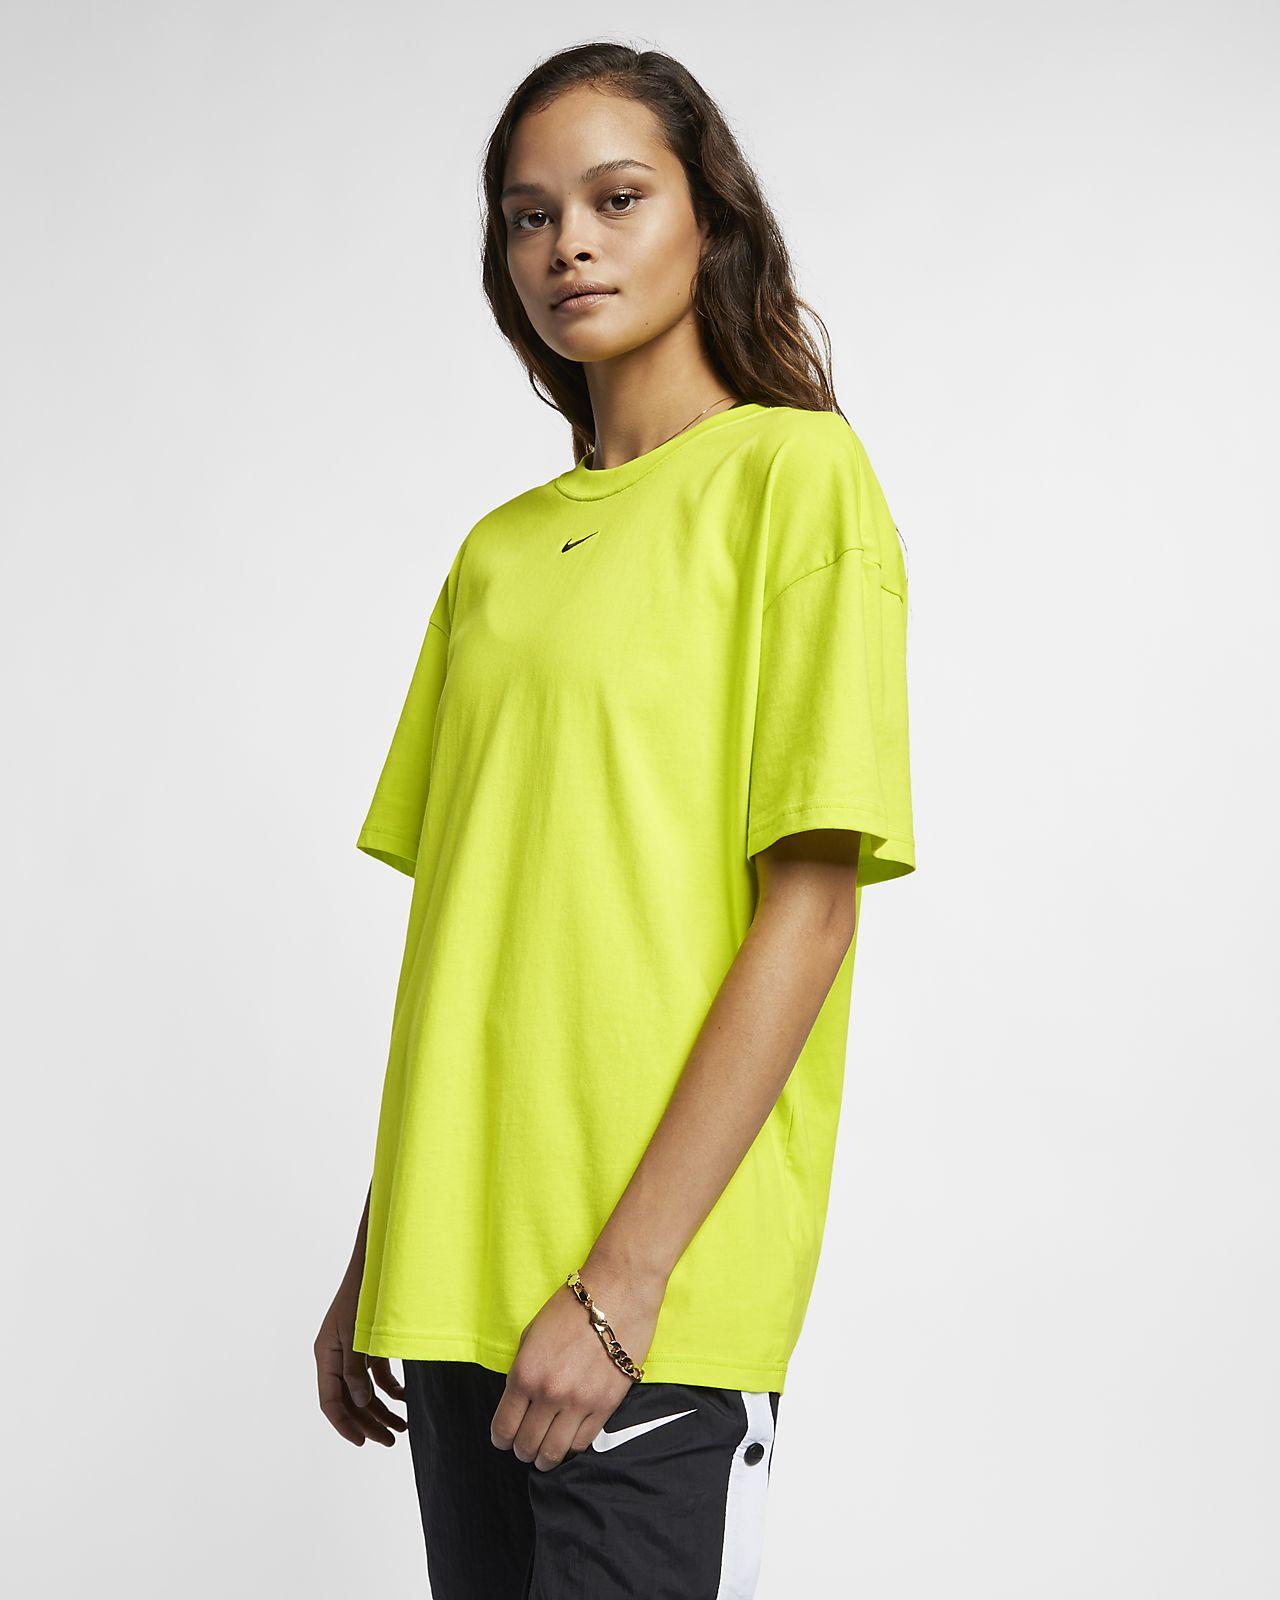 Nike Sportswear Essential rövid ujjú női felső. Nike.com HU f61a651e7c